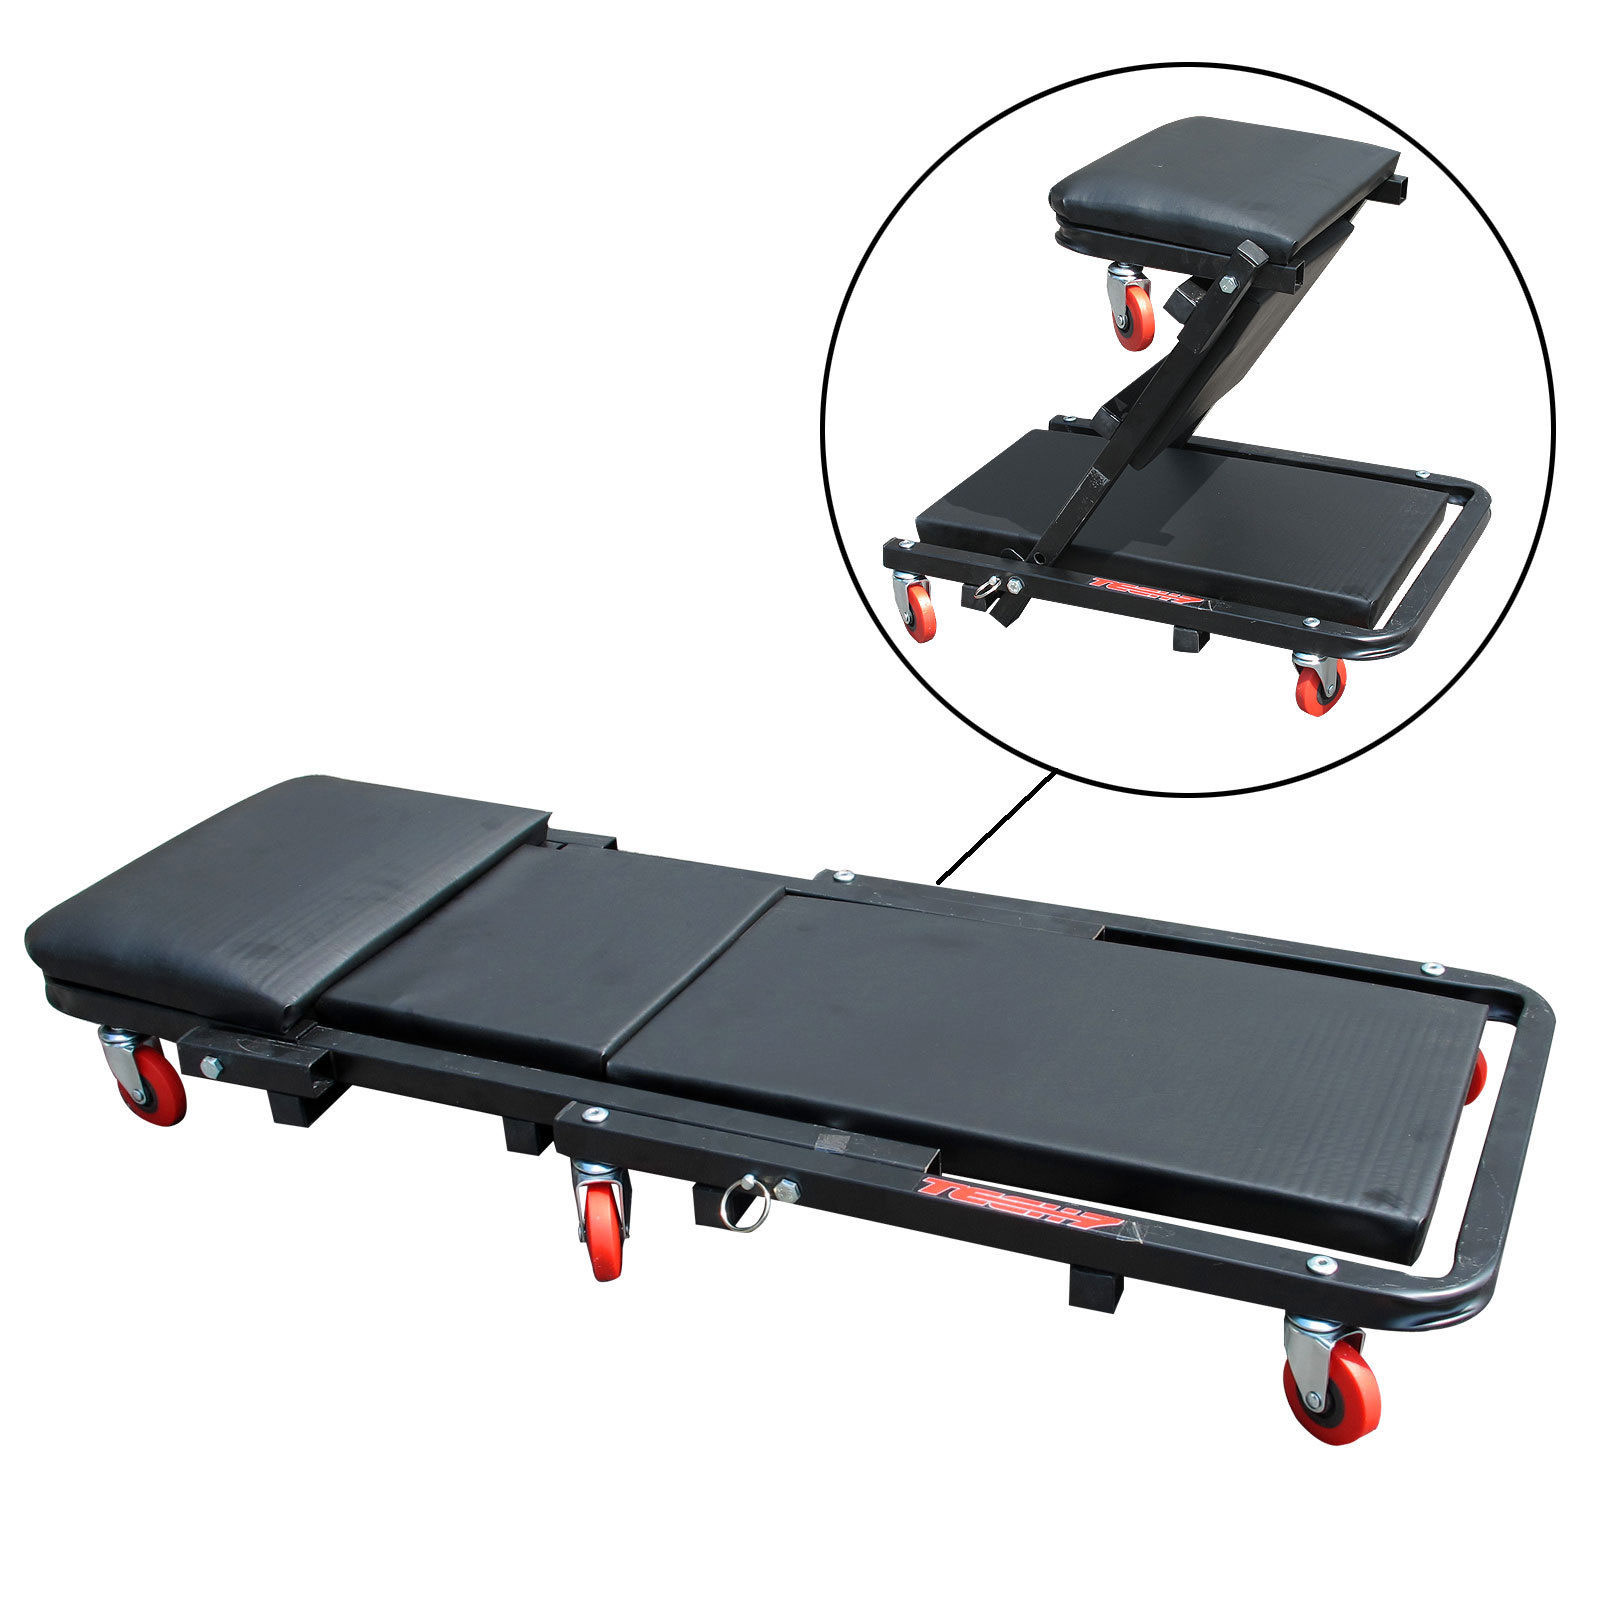 Folding Inspection Trolley / Garage Creeper Seat